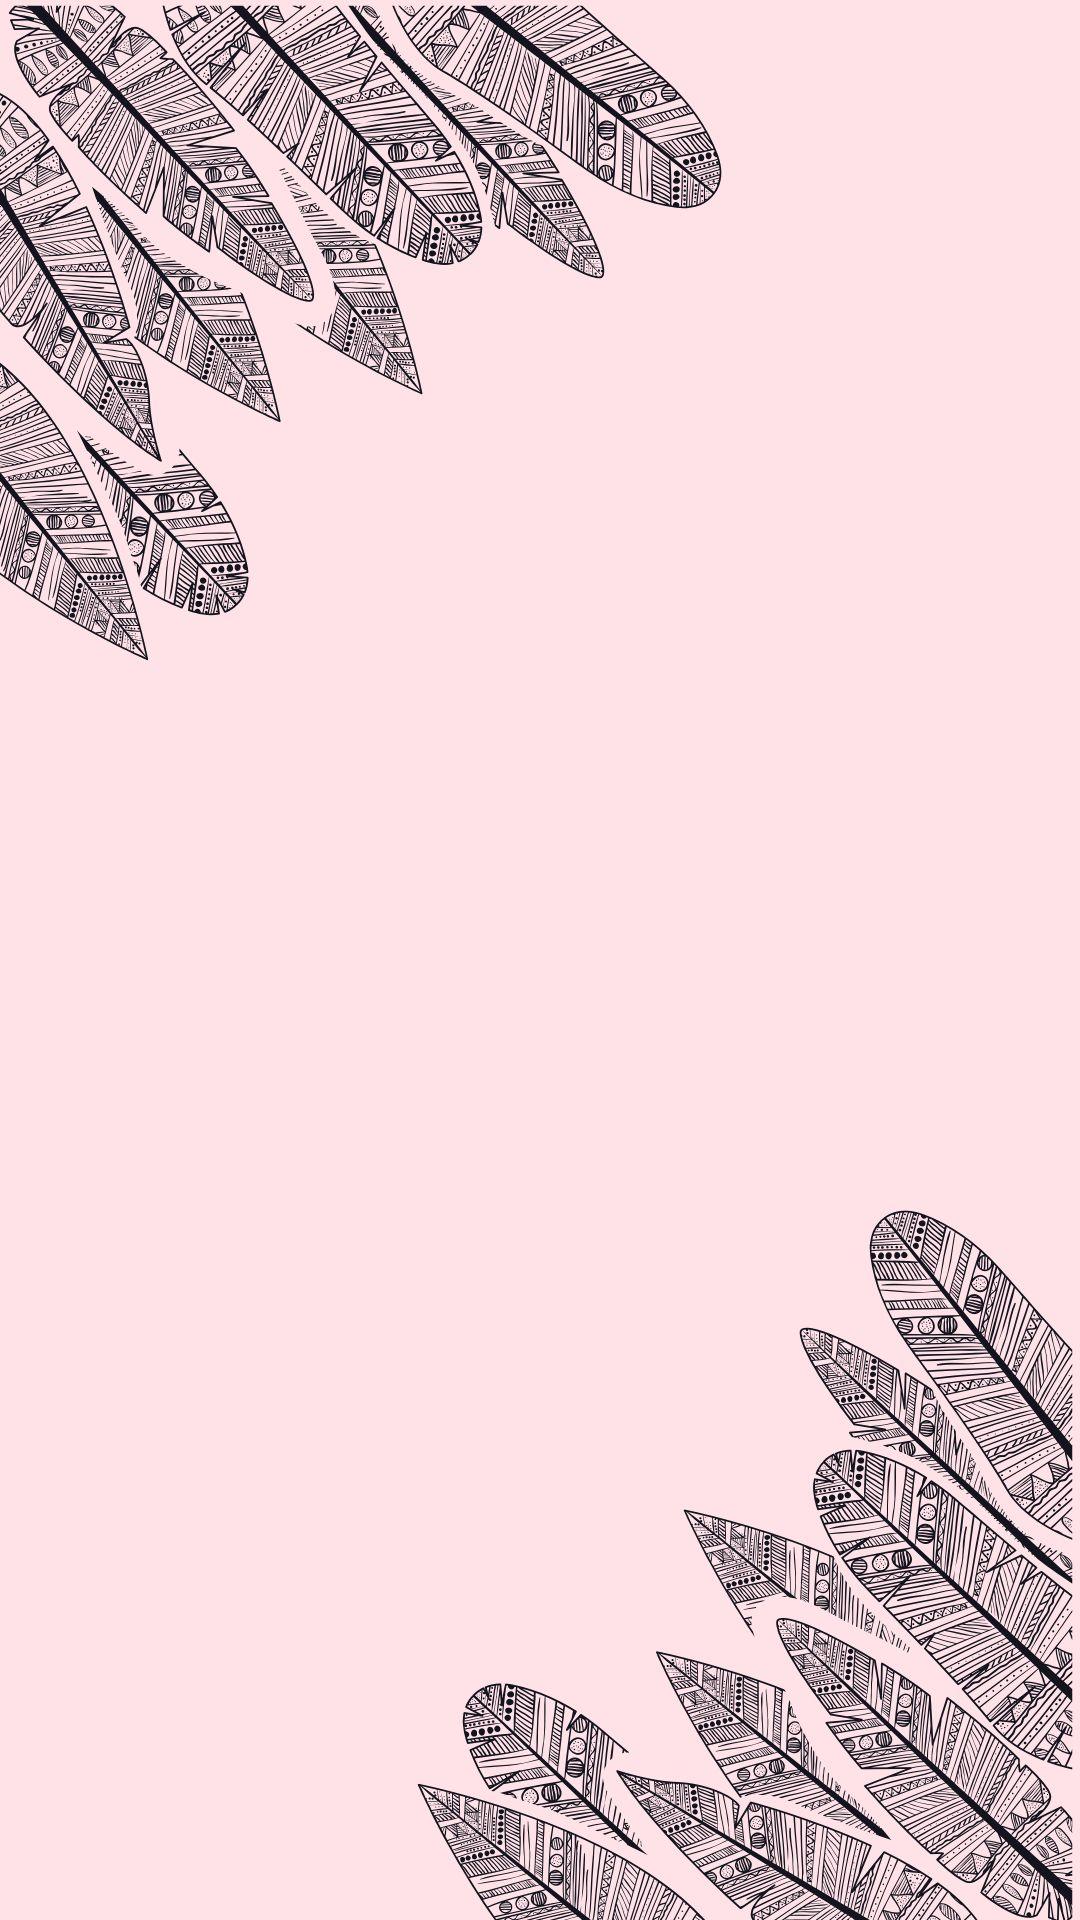 Iphone Background Instagram Story Templates Objek Gambar Seni